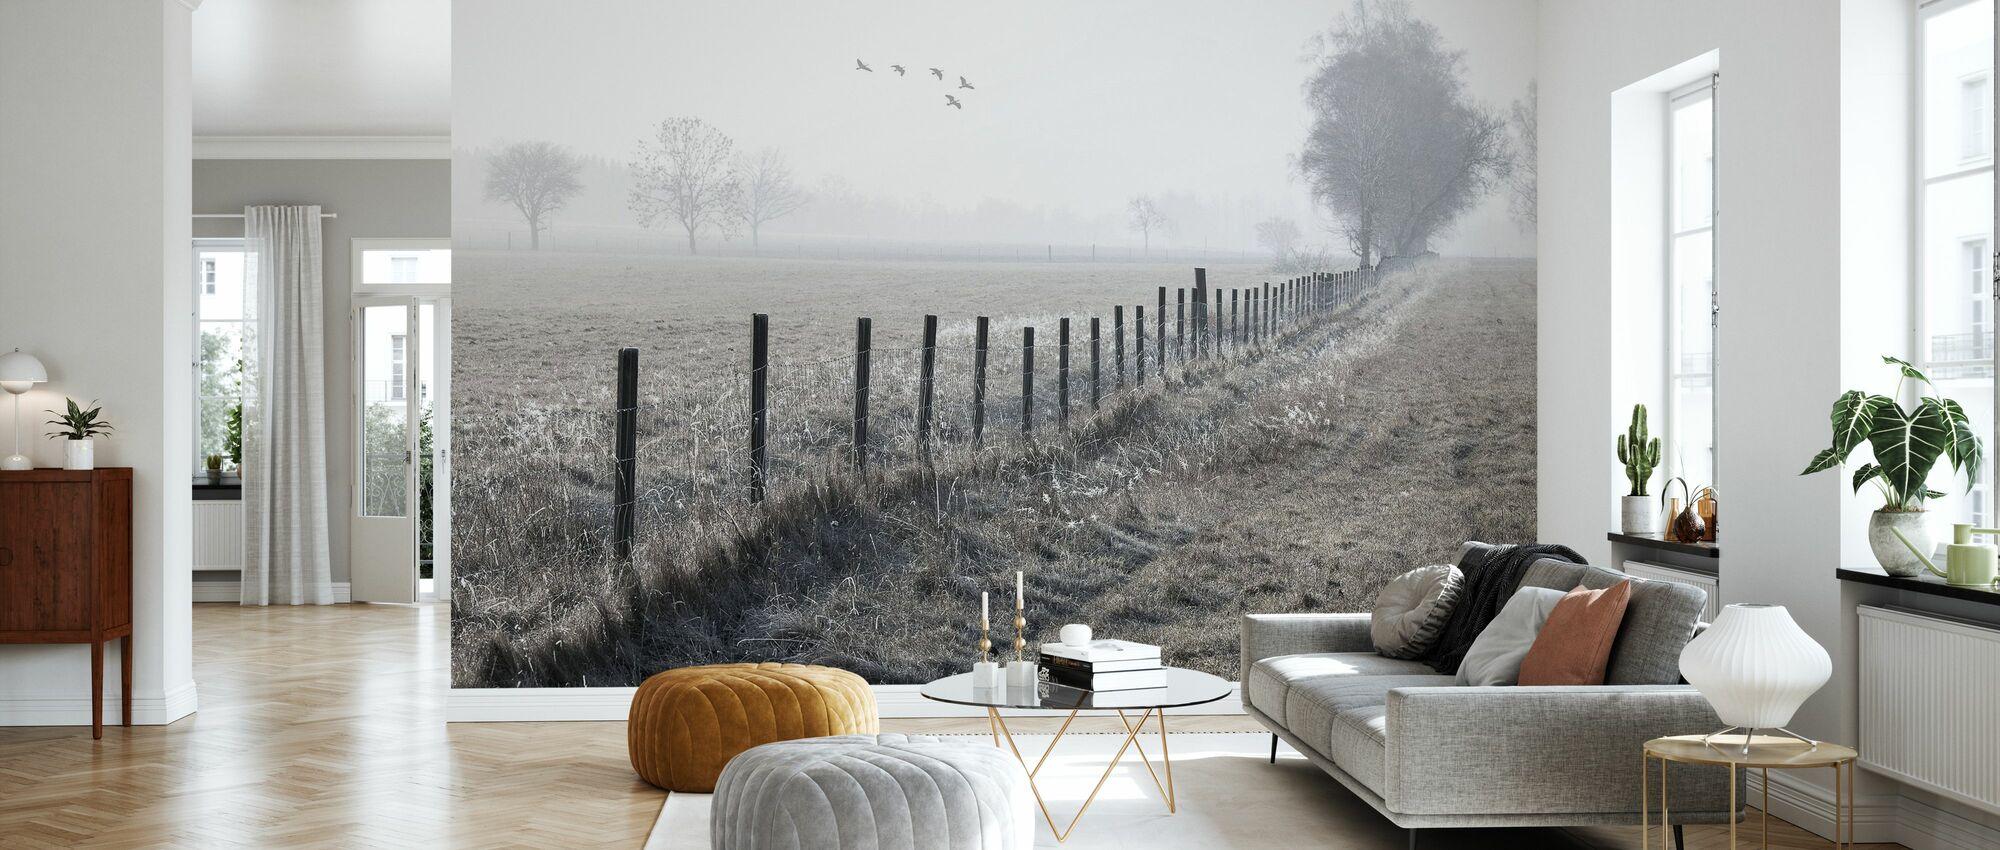 Foggy Morning - Wallpaper - Living Room